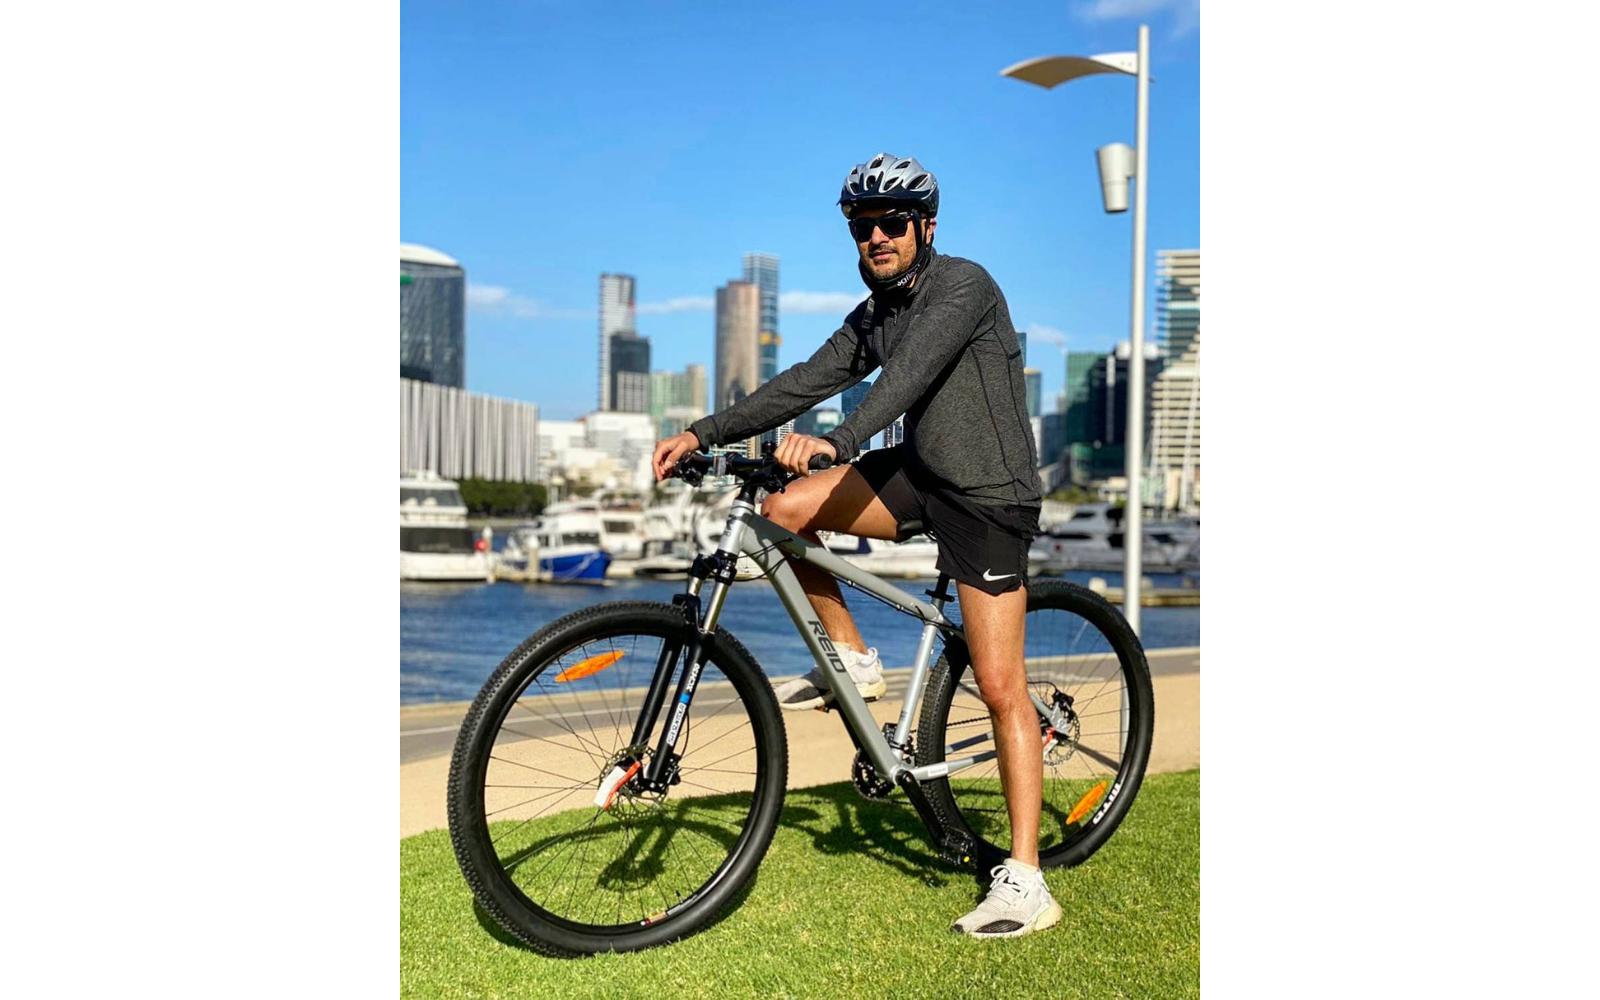 Copy of Copy of Lifestyle images 2 2 - Reid ® - Xenon Bike